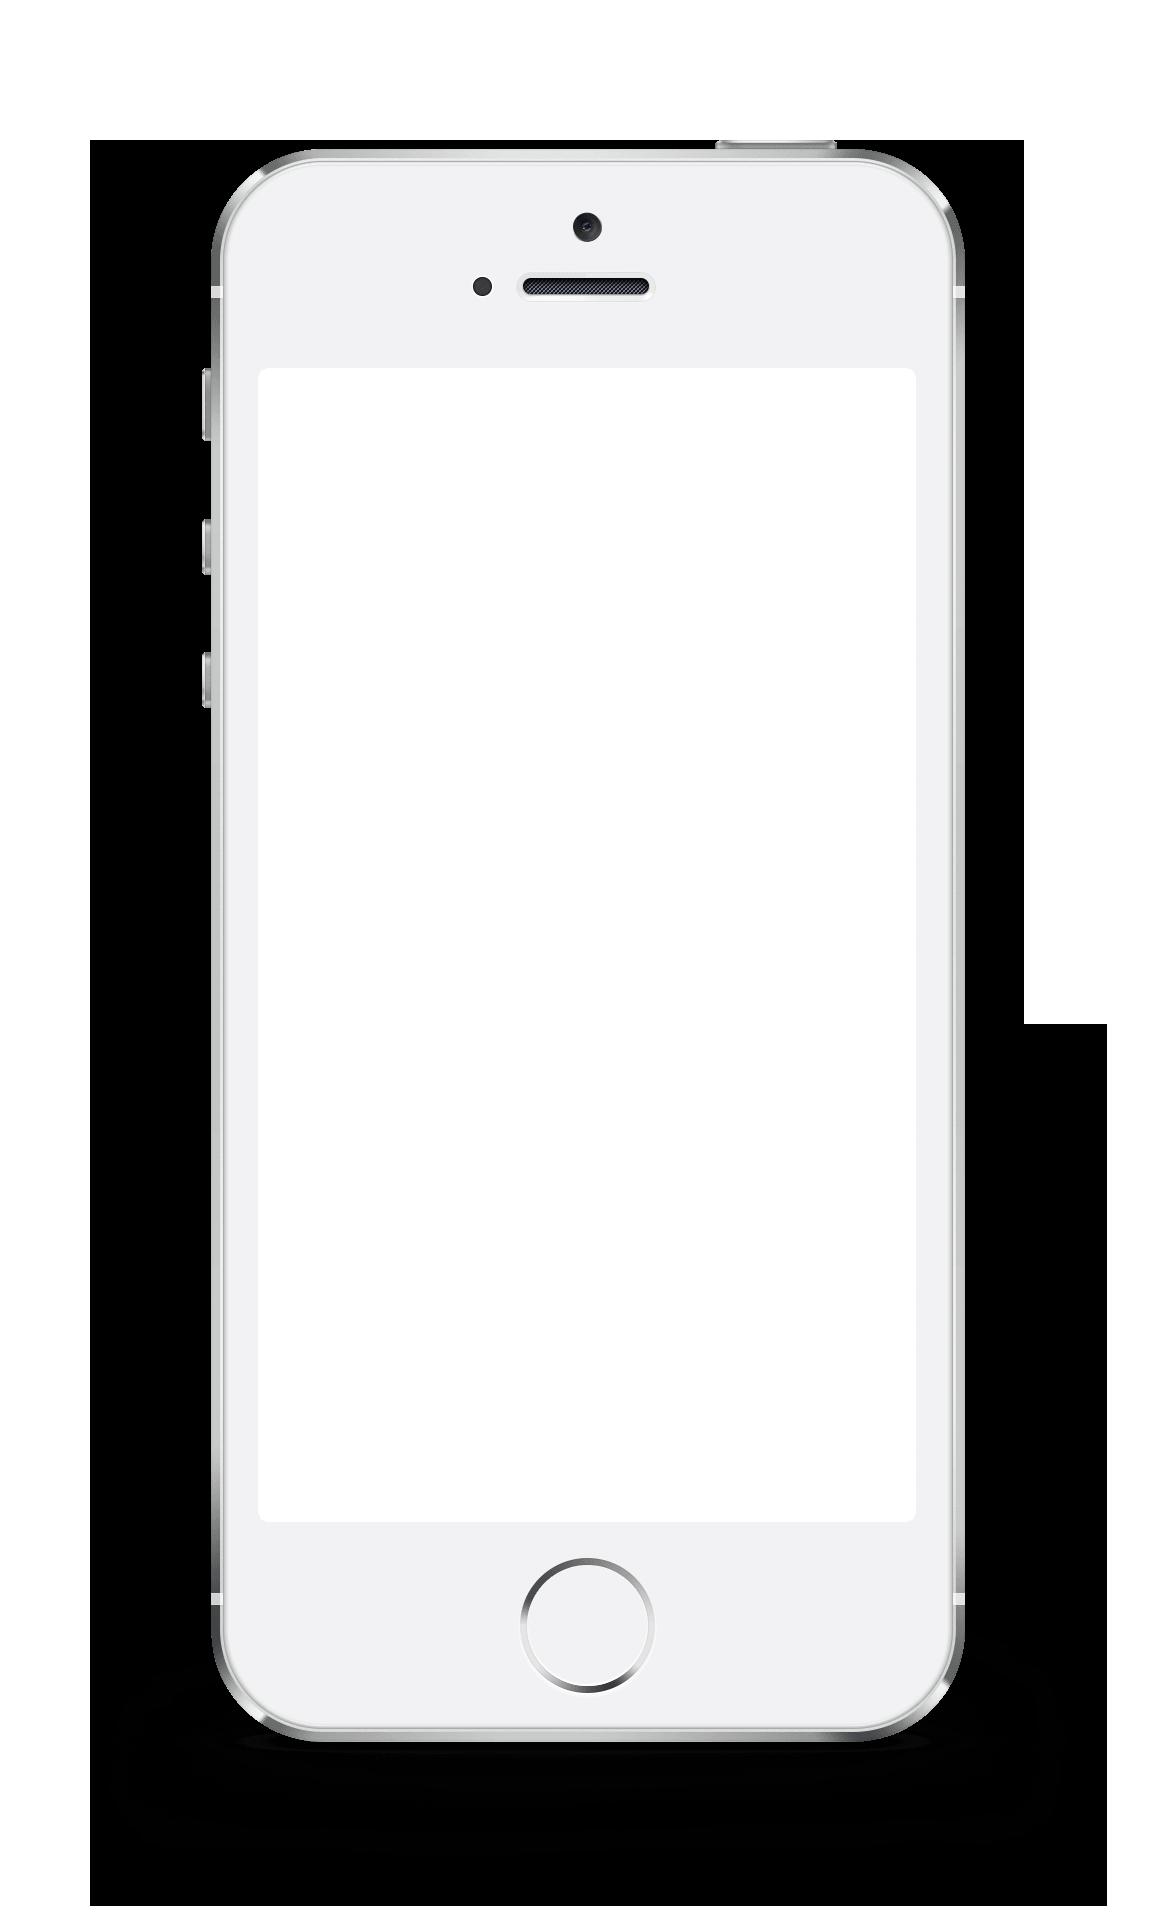 Apple ipad clipart jpg freeuse library Backcountry App - Available on iPhone & iPad | Backcountry.com jpg freeuse library